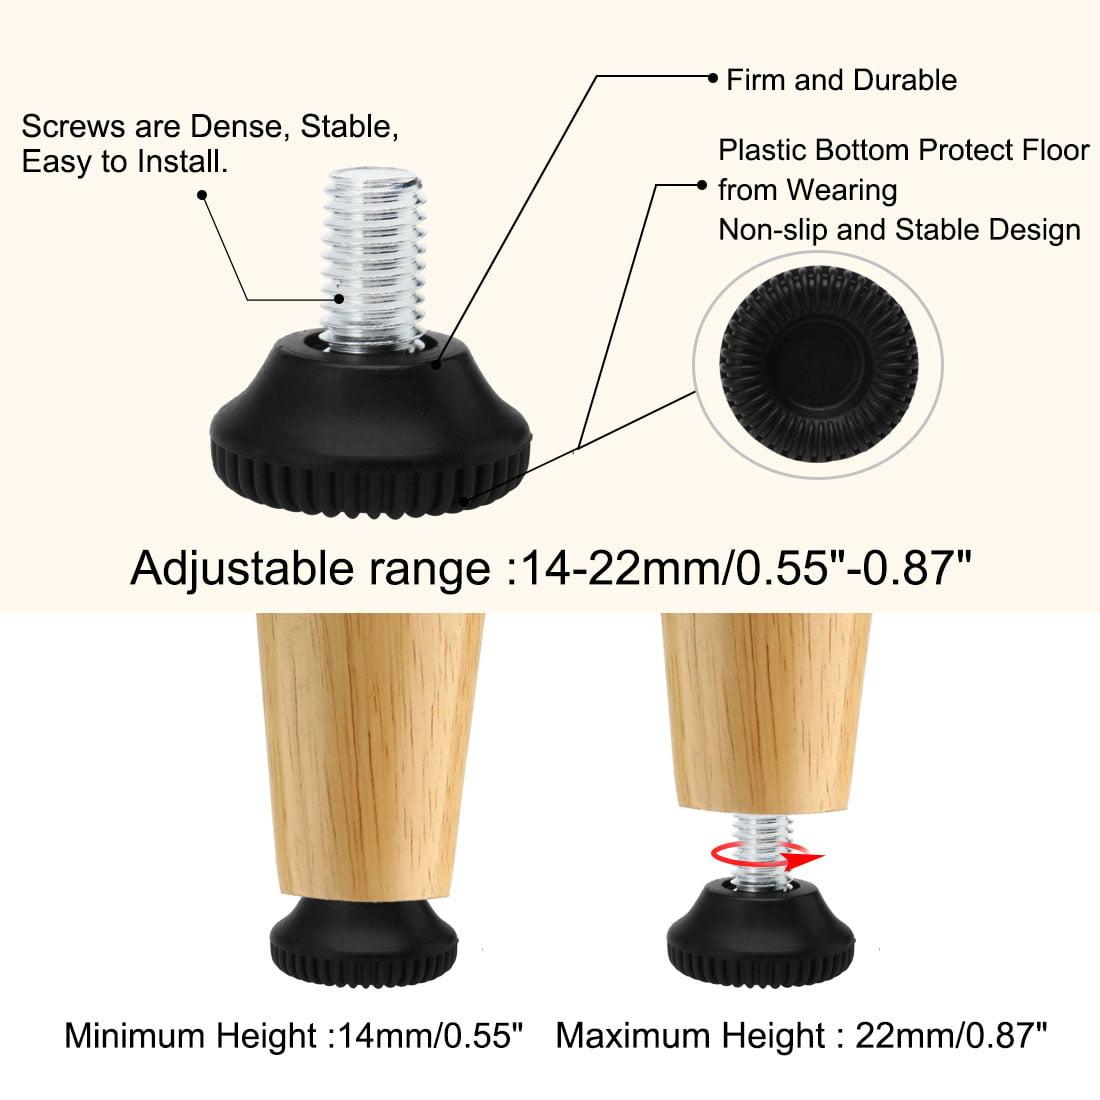 M6 x 20 x 25mm Adjustable Leveling Feet Floor Protector for Table Leg 24pcs - image 3 de 7